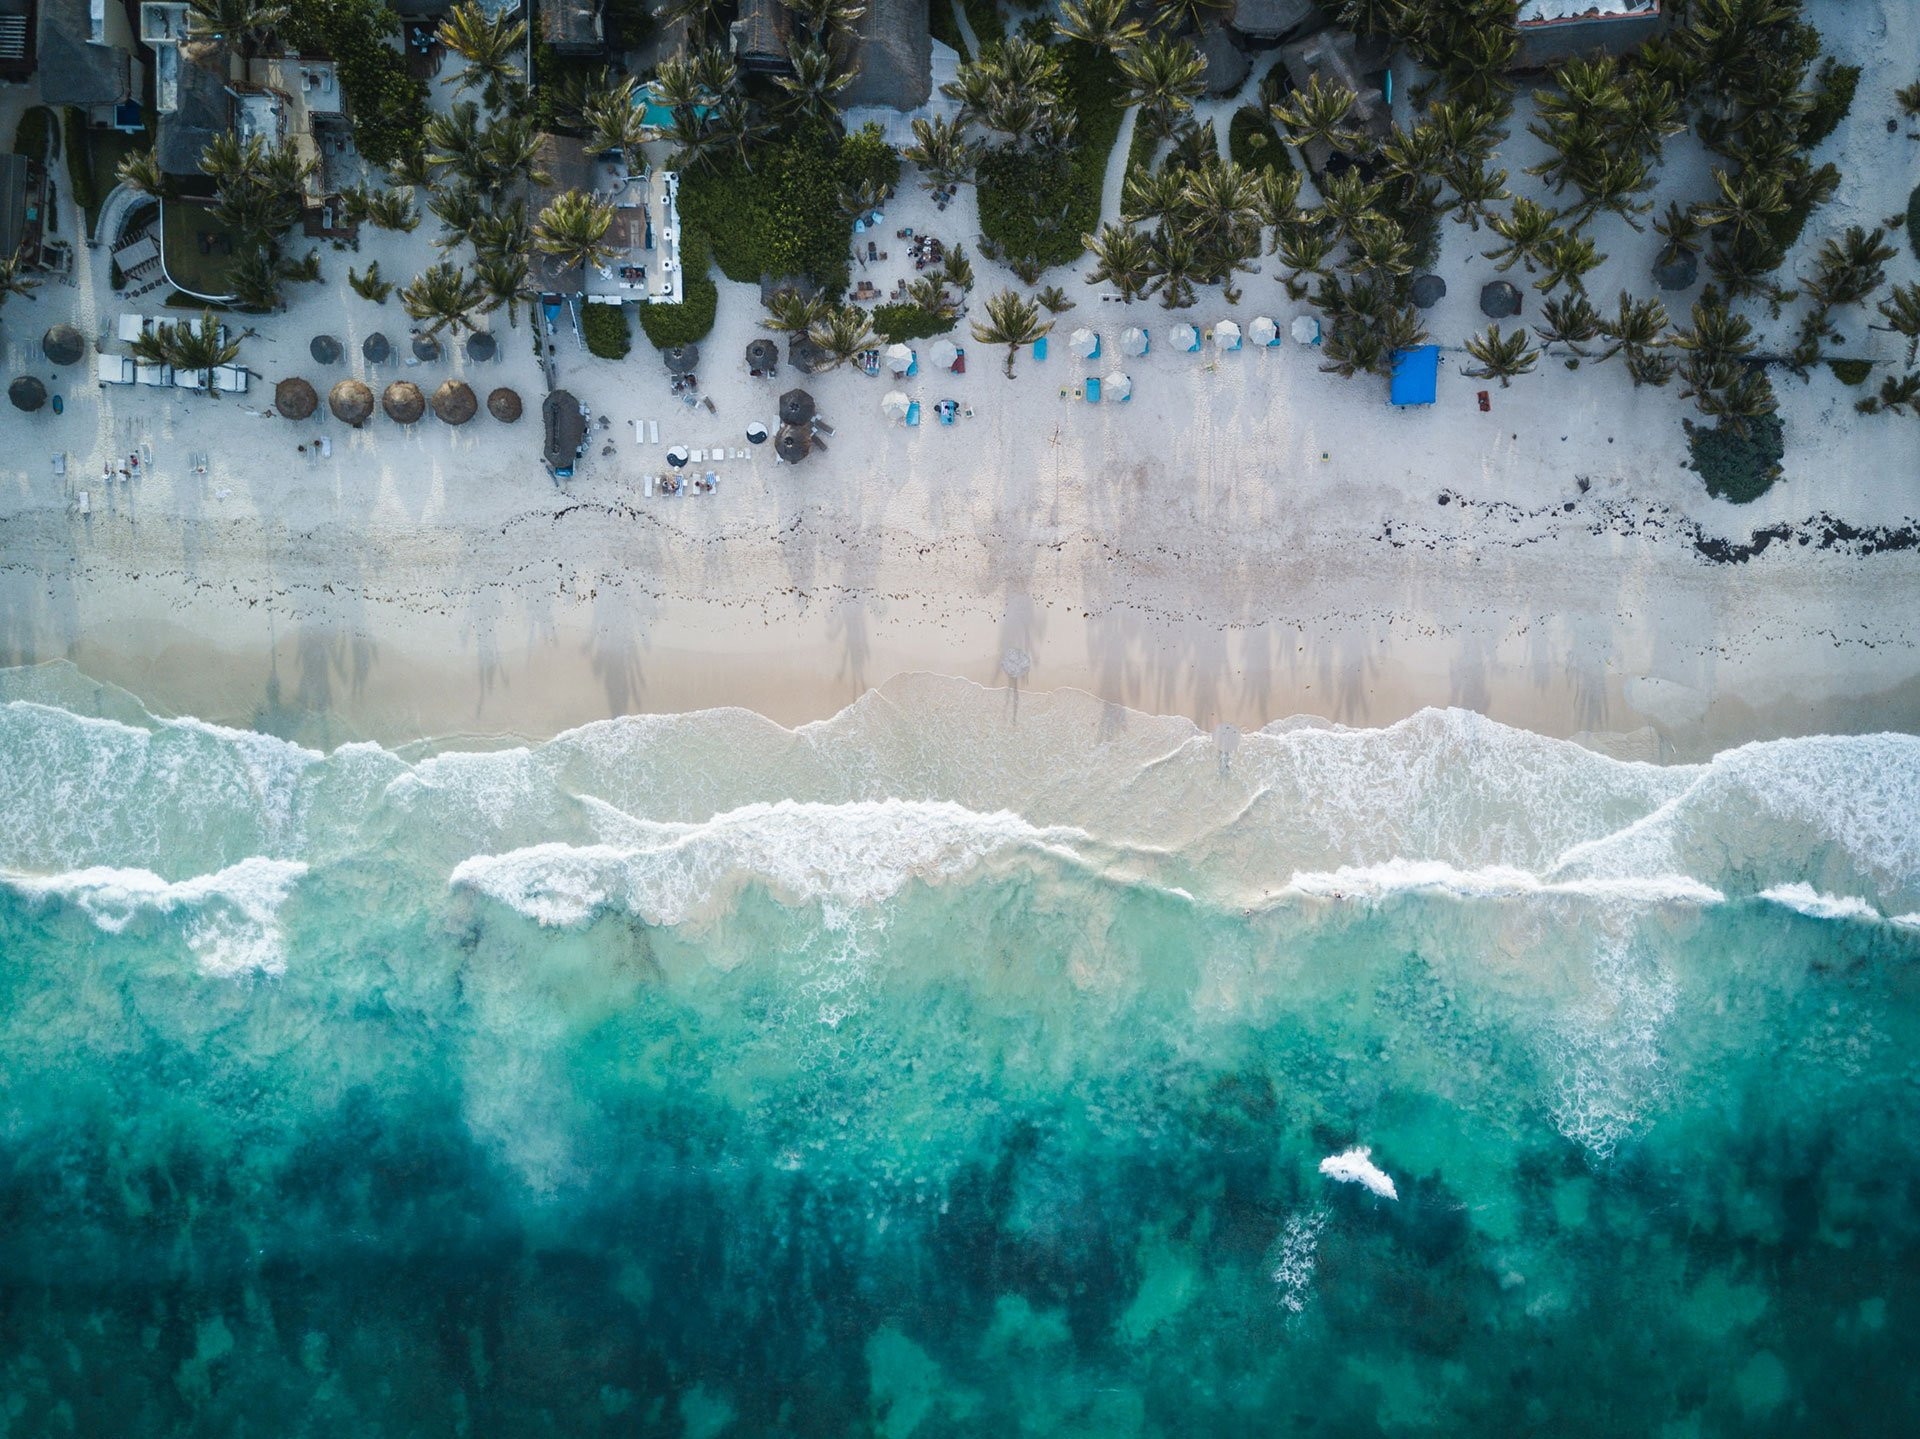 coast-drone-view